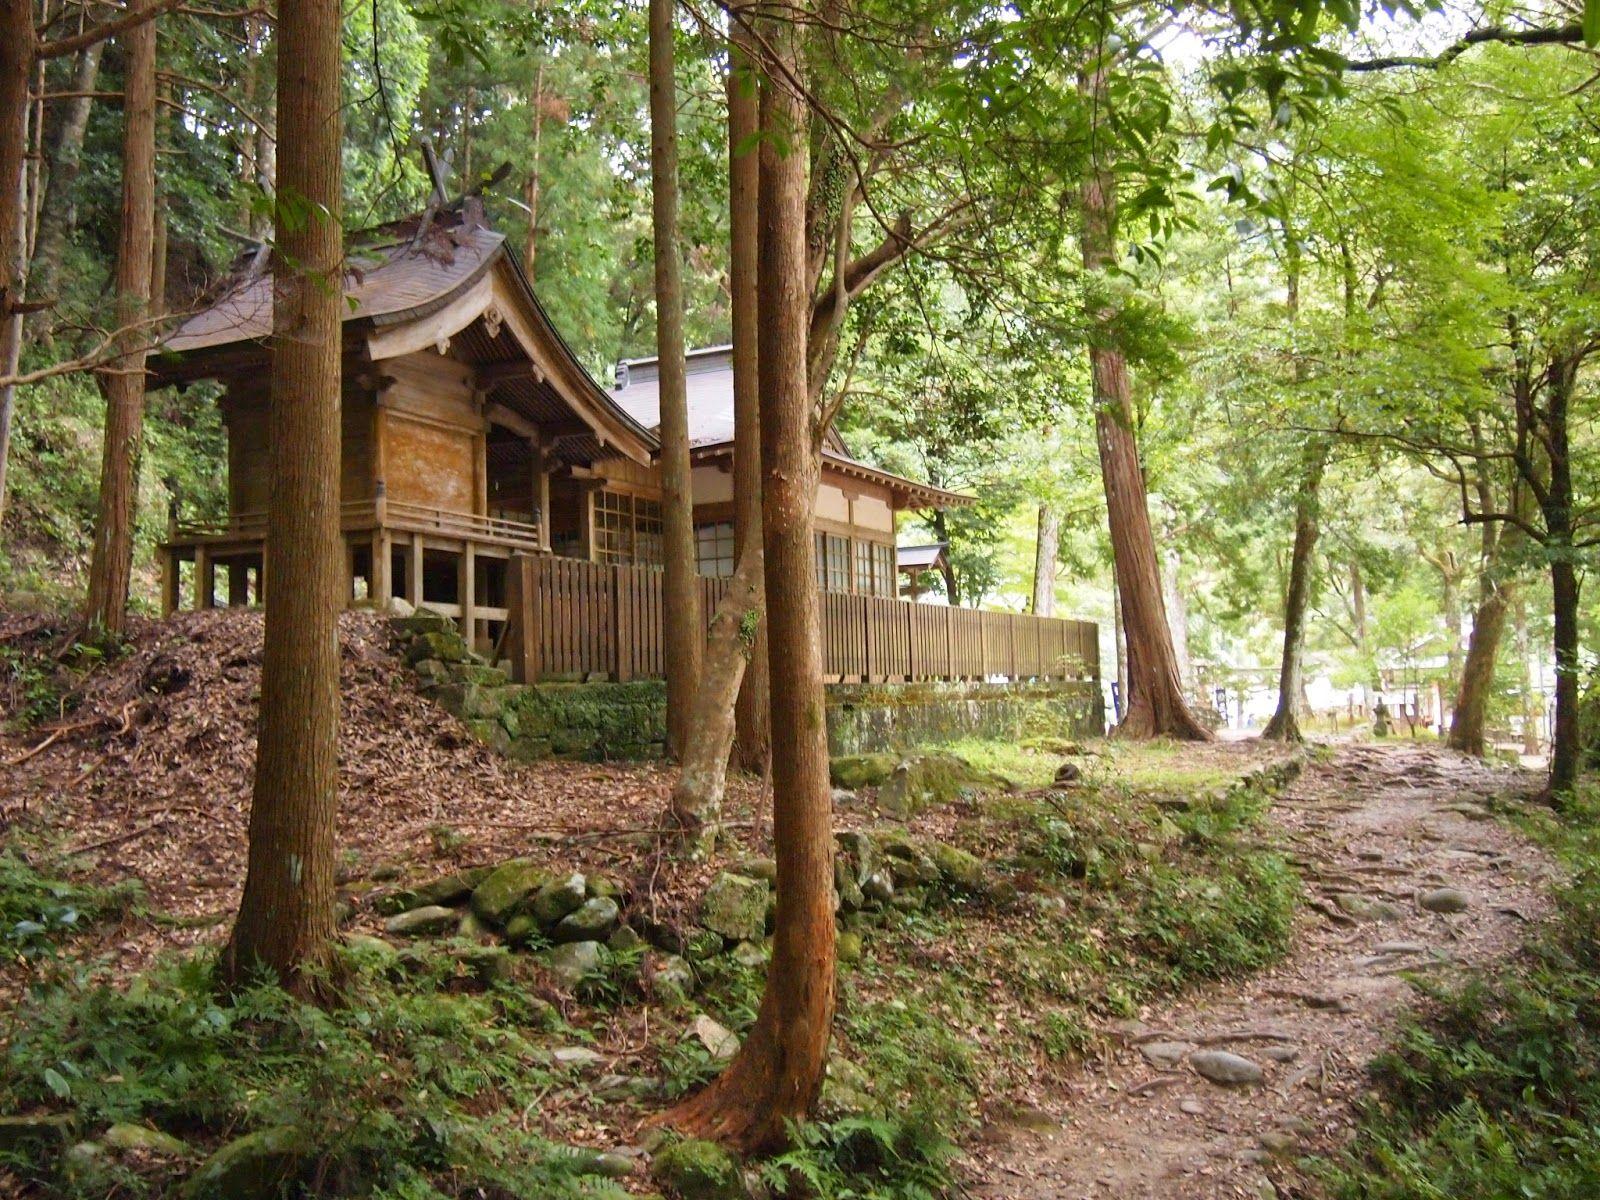 Kiri-no-Sato Takahara Hotel: A Refuge on Japan\'s Kumano Kodo ...